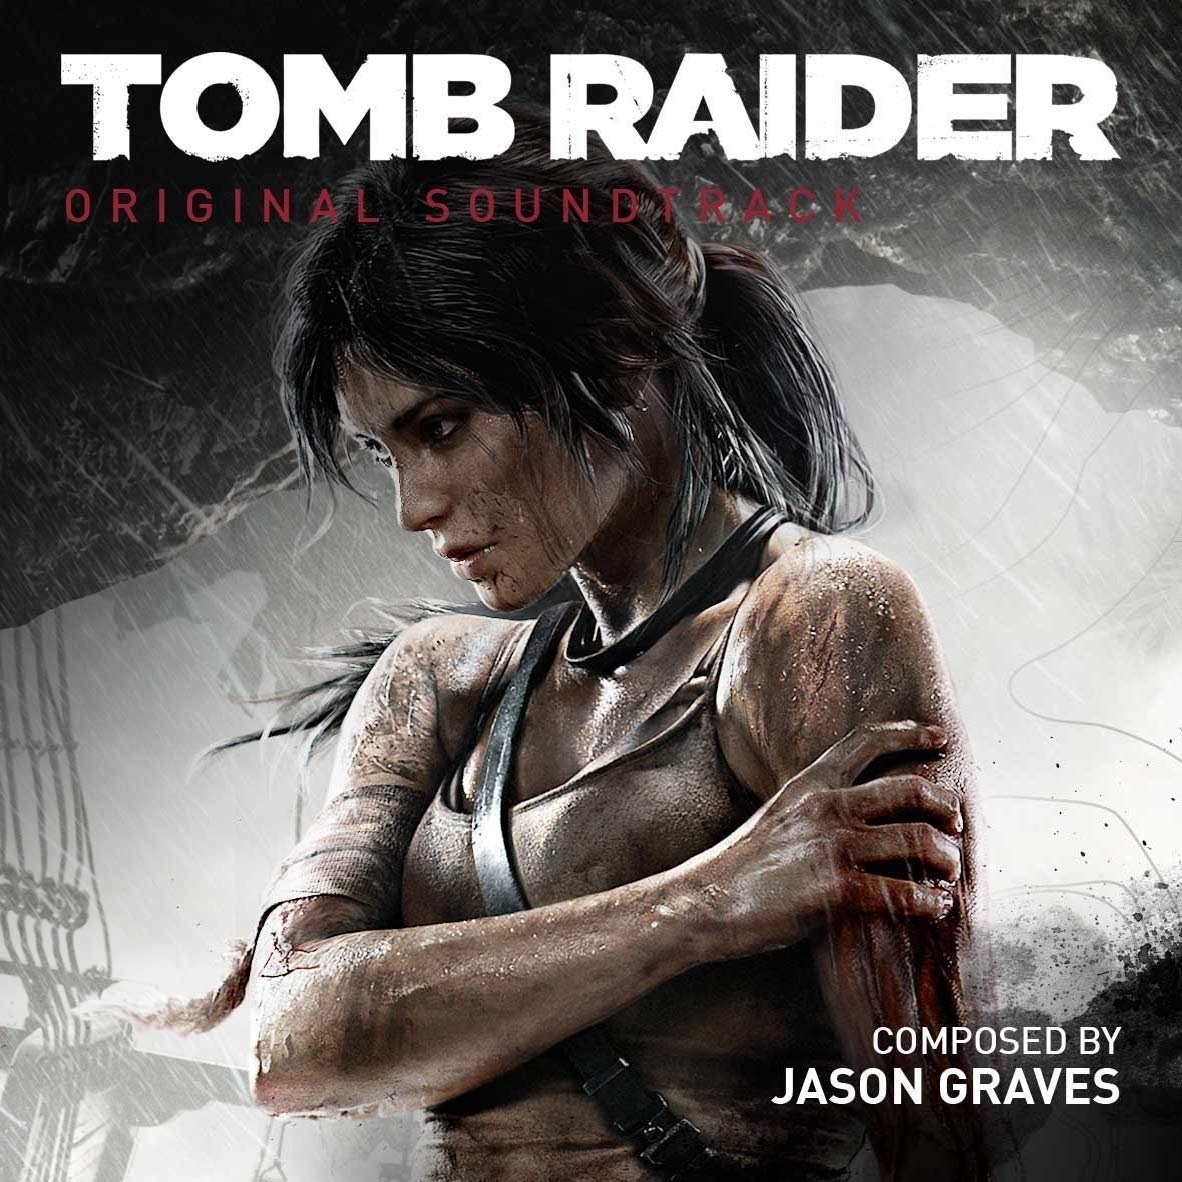 Tomb Raider O S T Tomb Raider Original Game Soundtrack